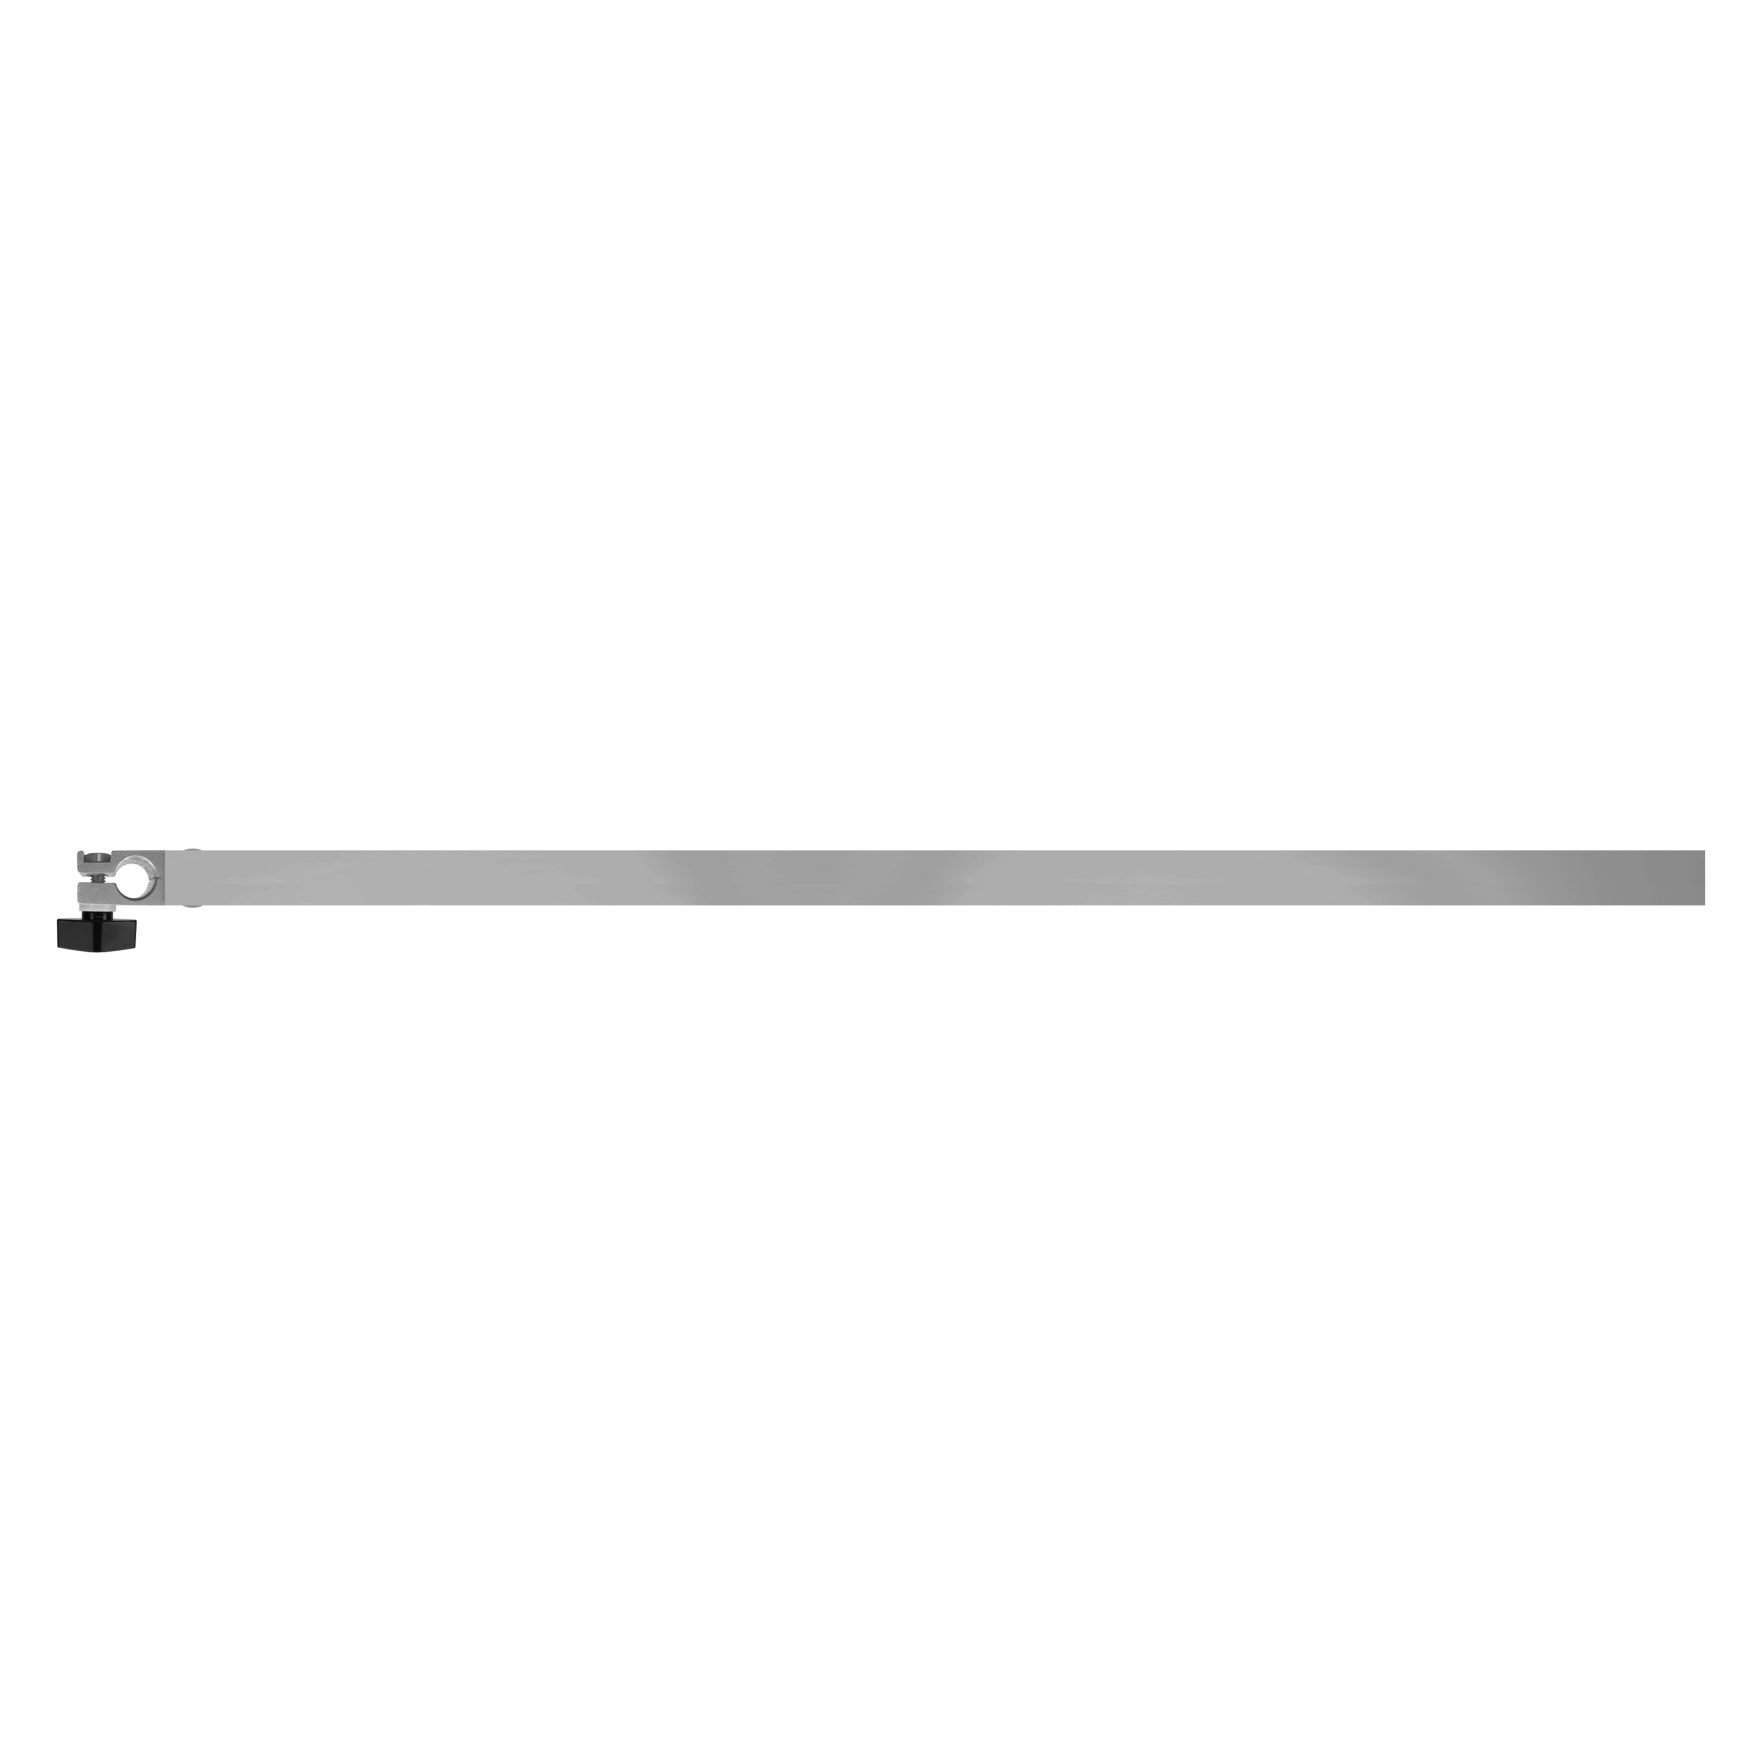 Bold Ivy Canoe Stabilizer Extension Arm - Single - Bottom